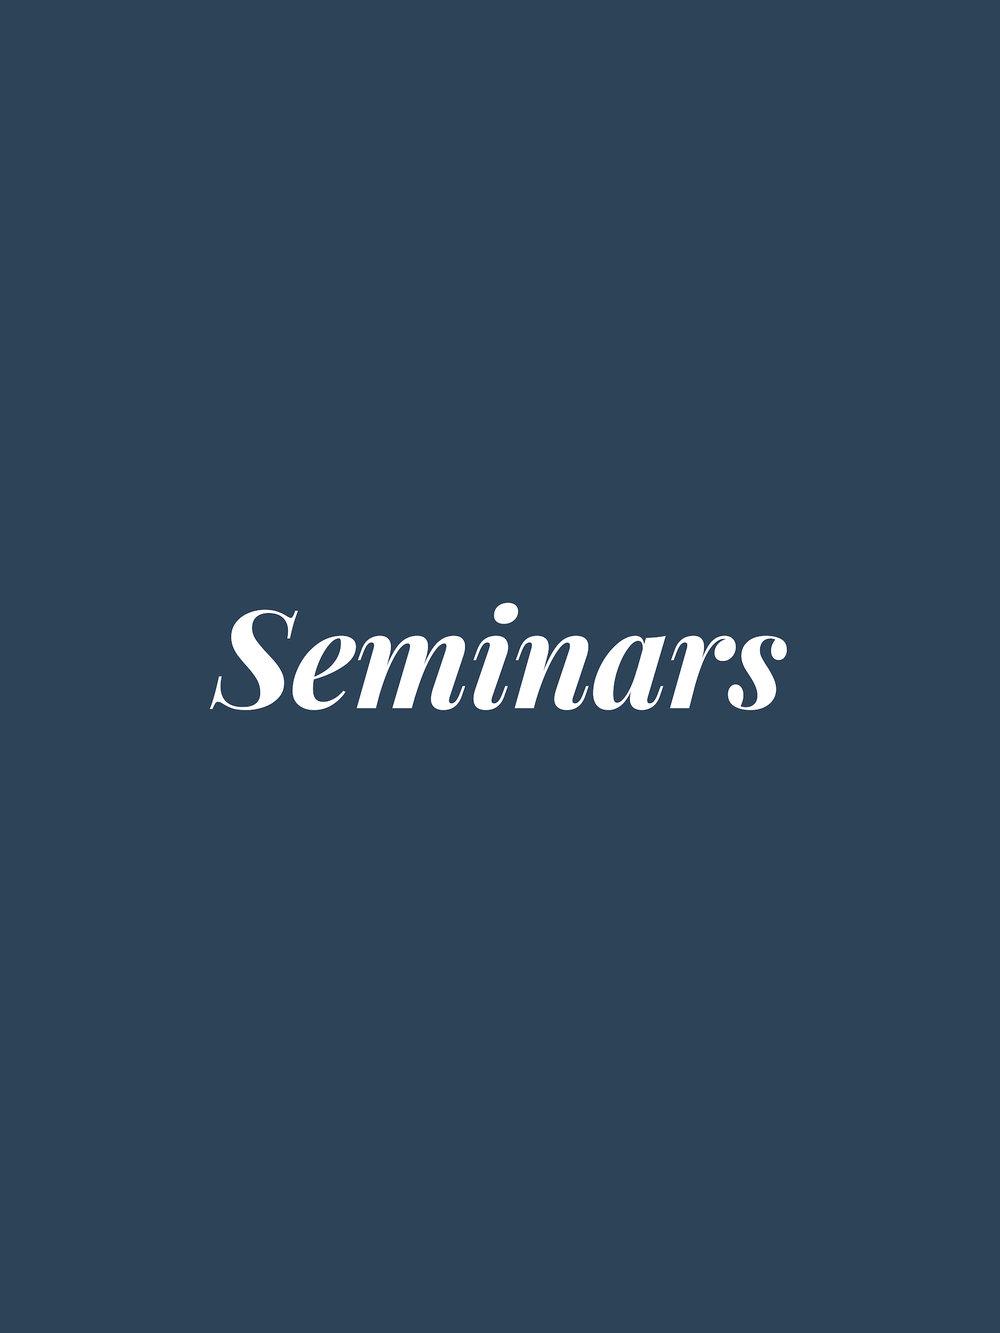 seminars2.jpg